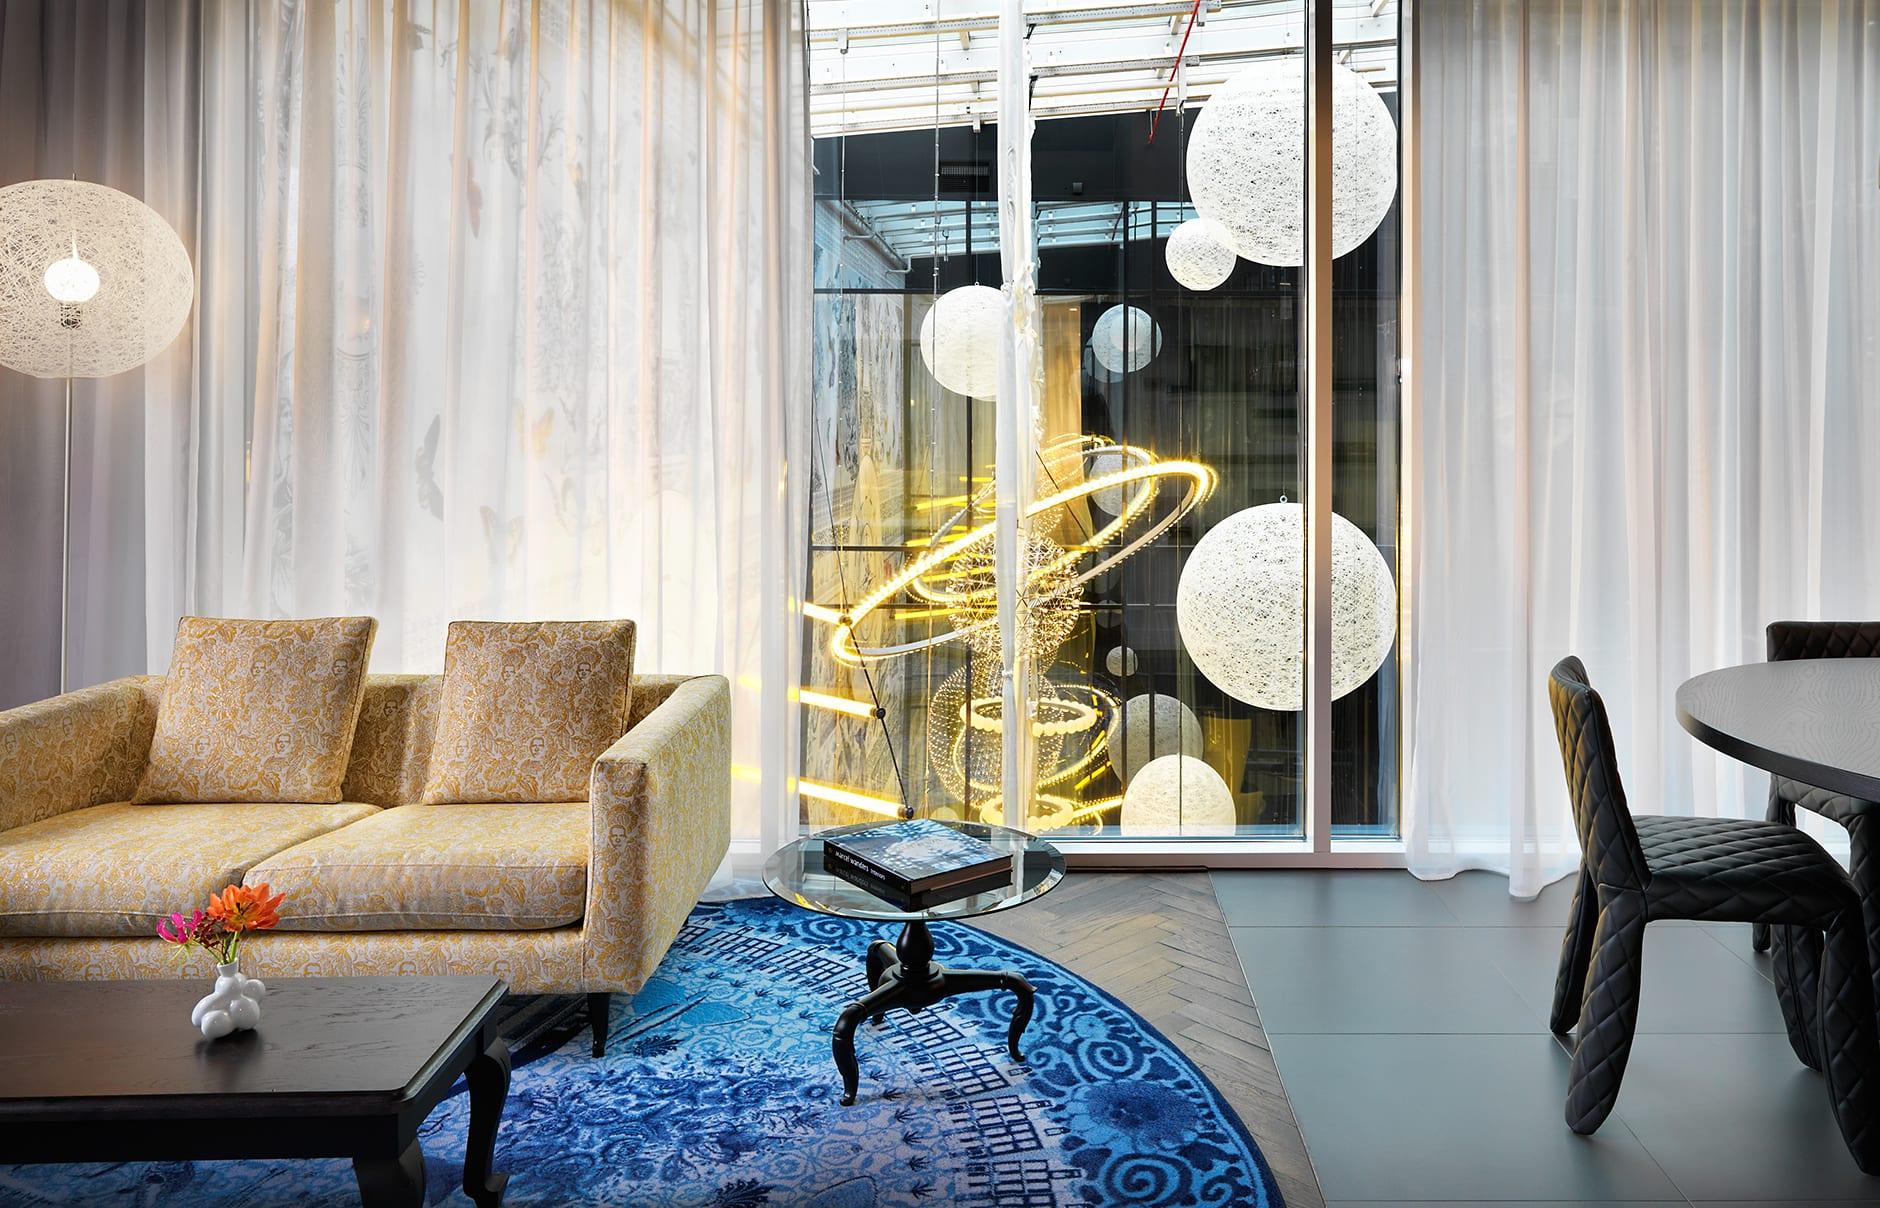 Andaz Amsterdam Prinsengracht, Netherlands. © 2015 Hyatt Corporation